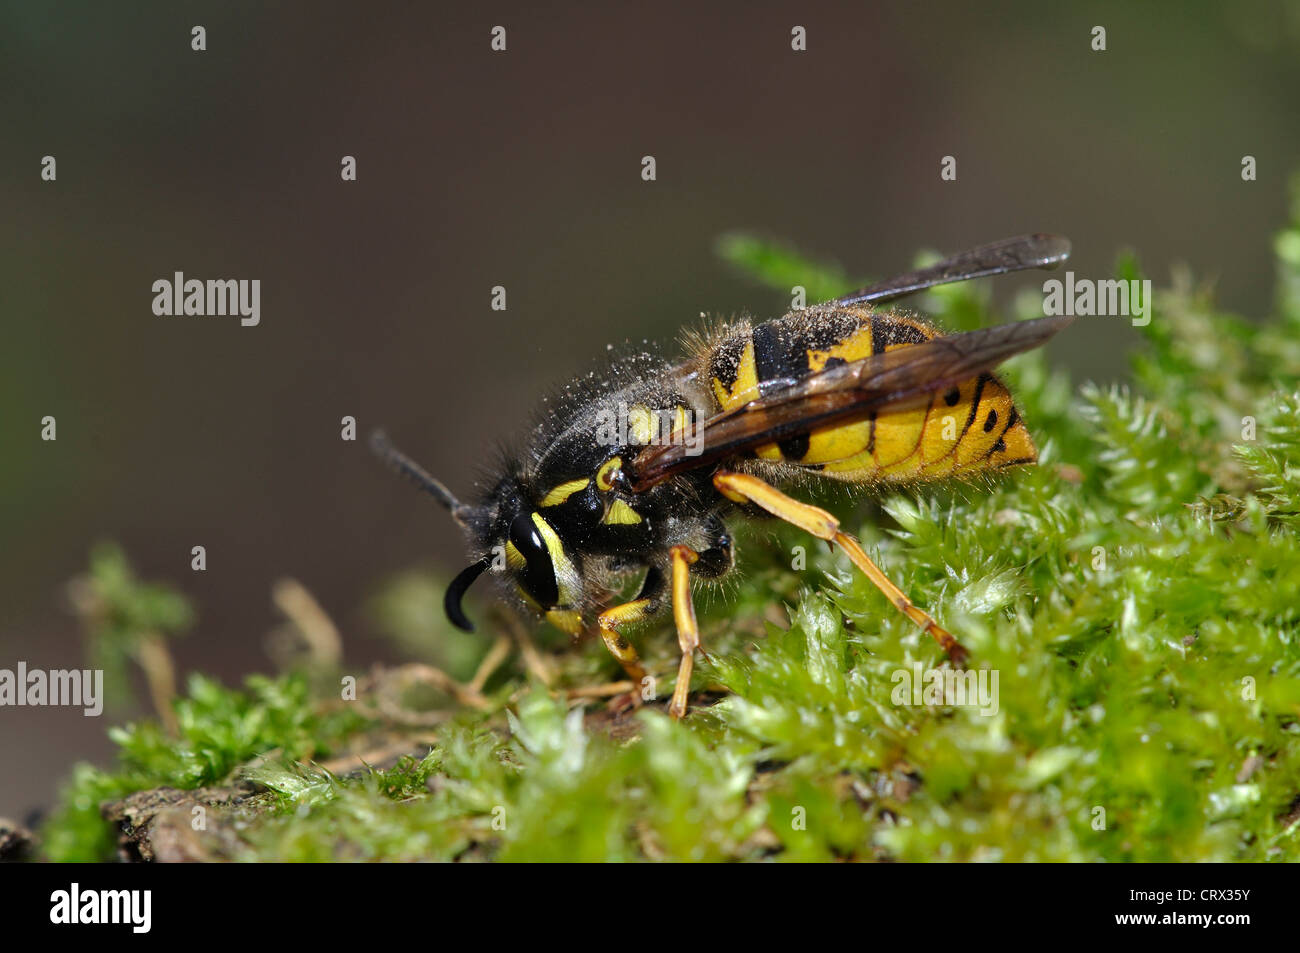 queen common wasp vespula vulgaris - Stock Image